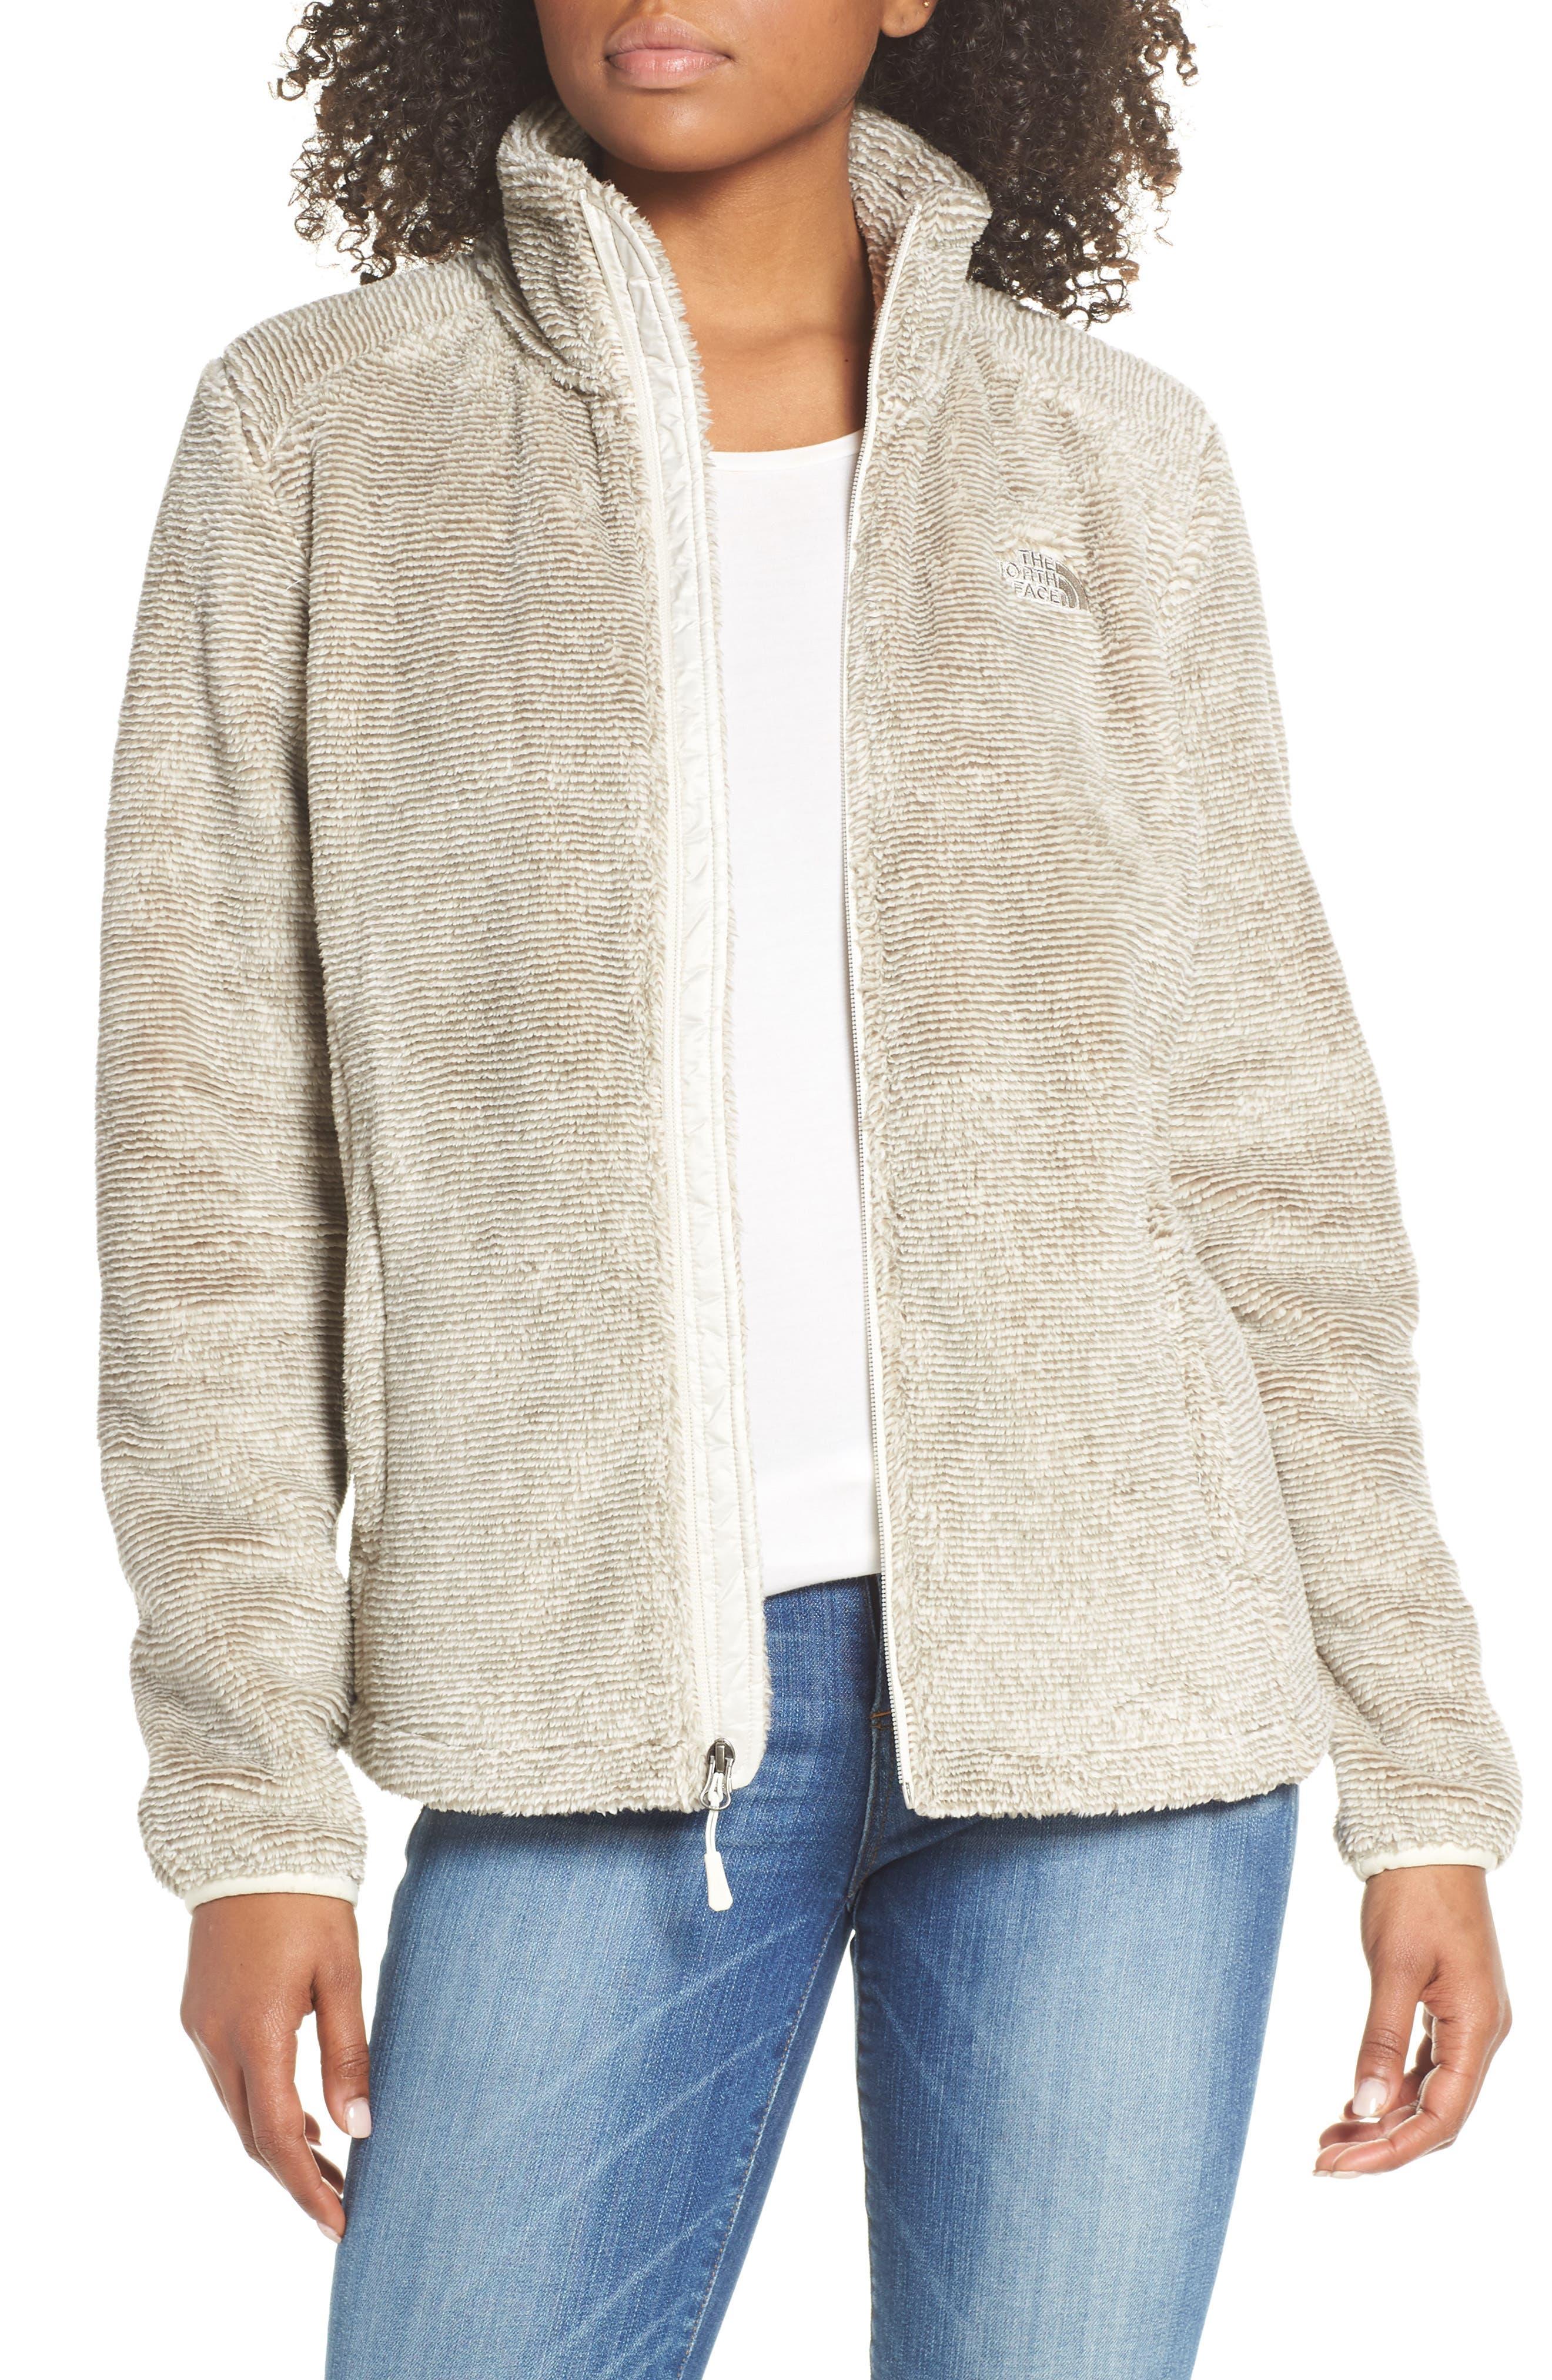 THE NORTH FACE Osito 2 Stripe Fleece Jacket, Main, color, GREY/ VINTAGE WHITE STRIPE